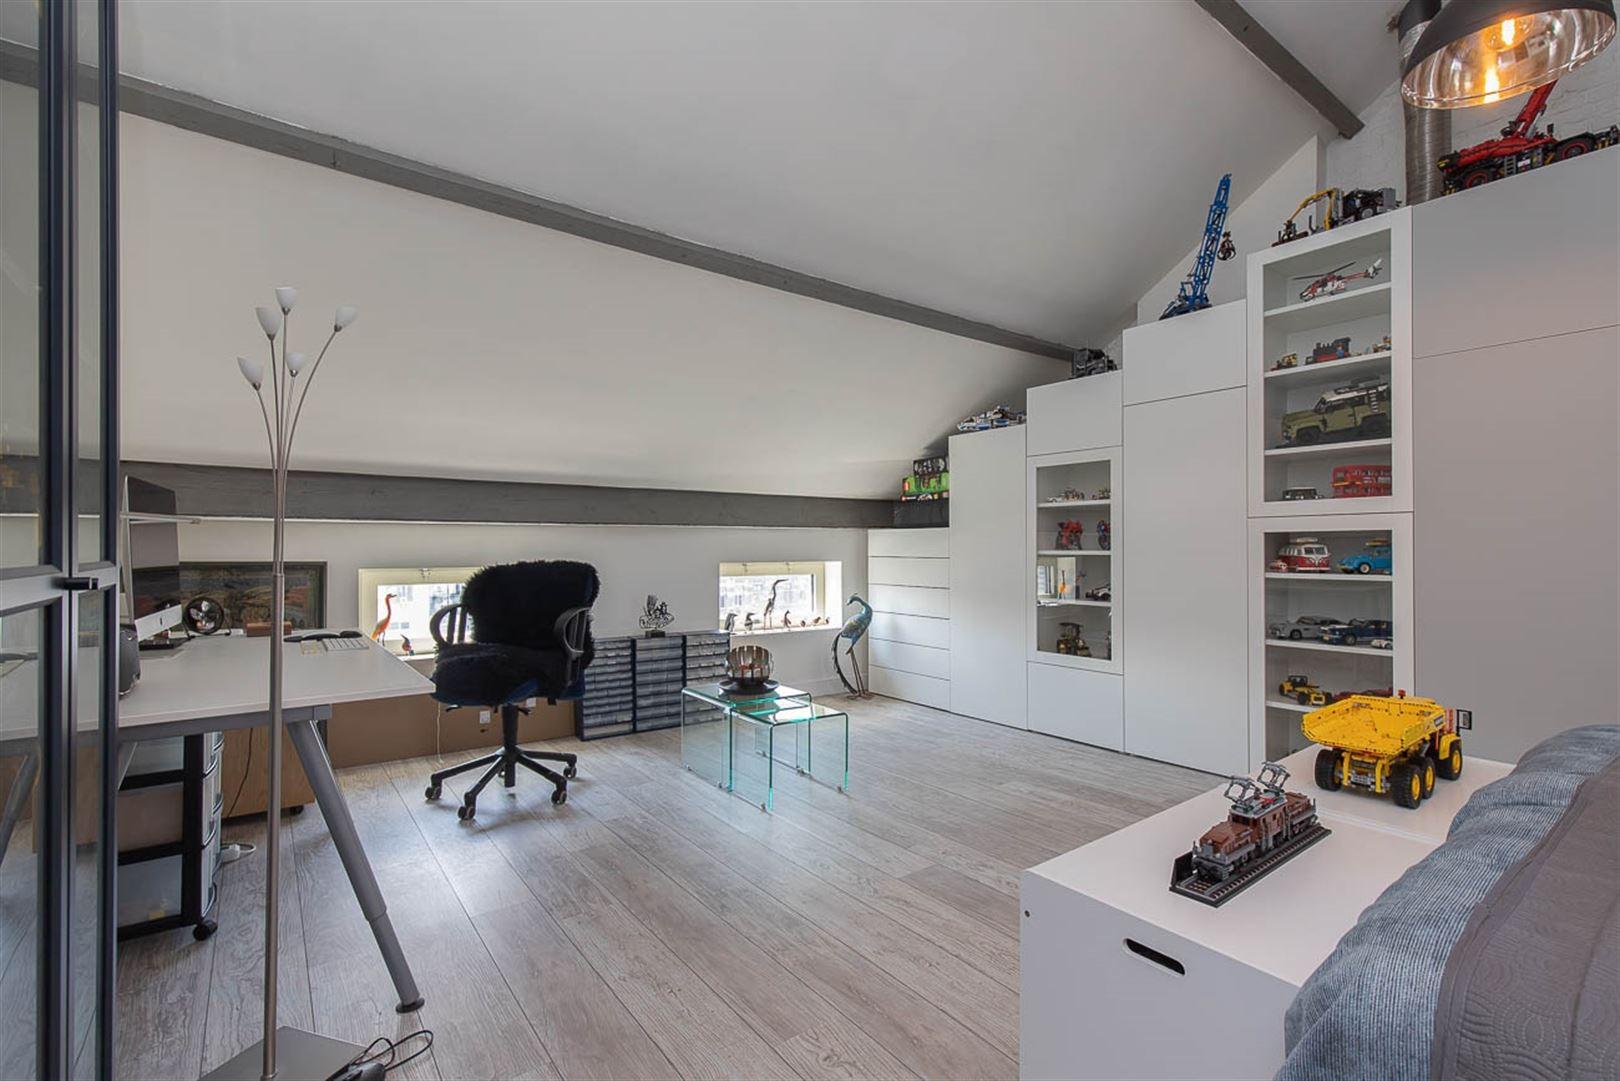 Foto 27 : Duplex/triplex te 9200 DENDERMONDE (België) - Prijs € 495.000